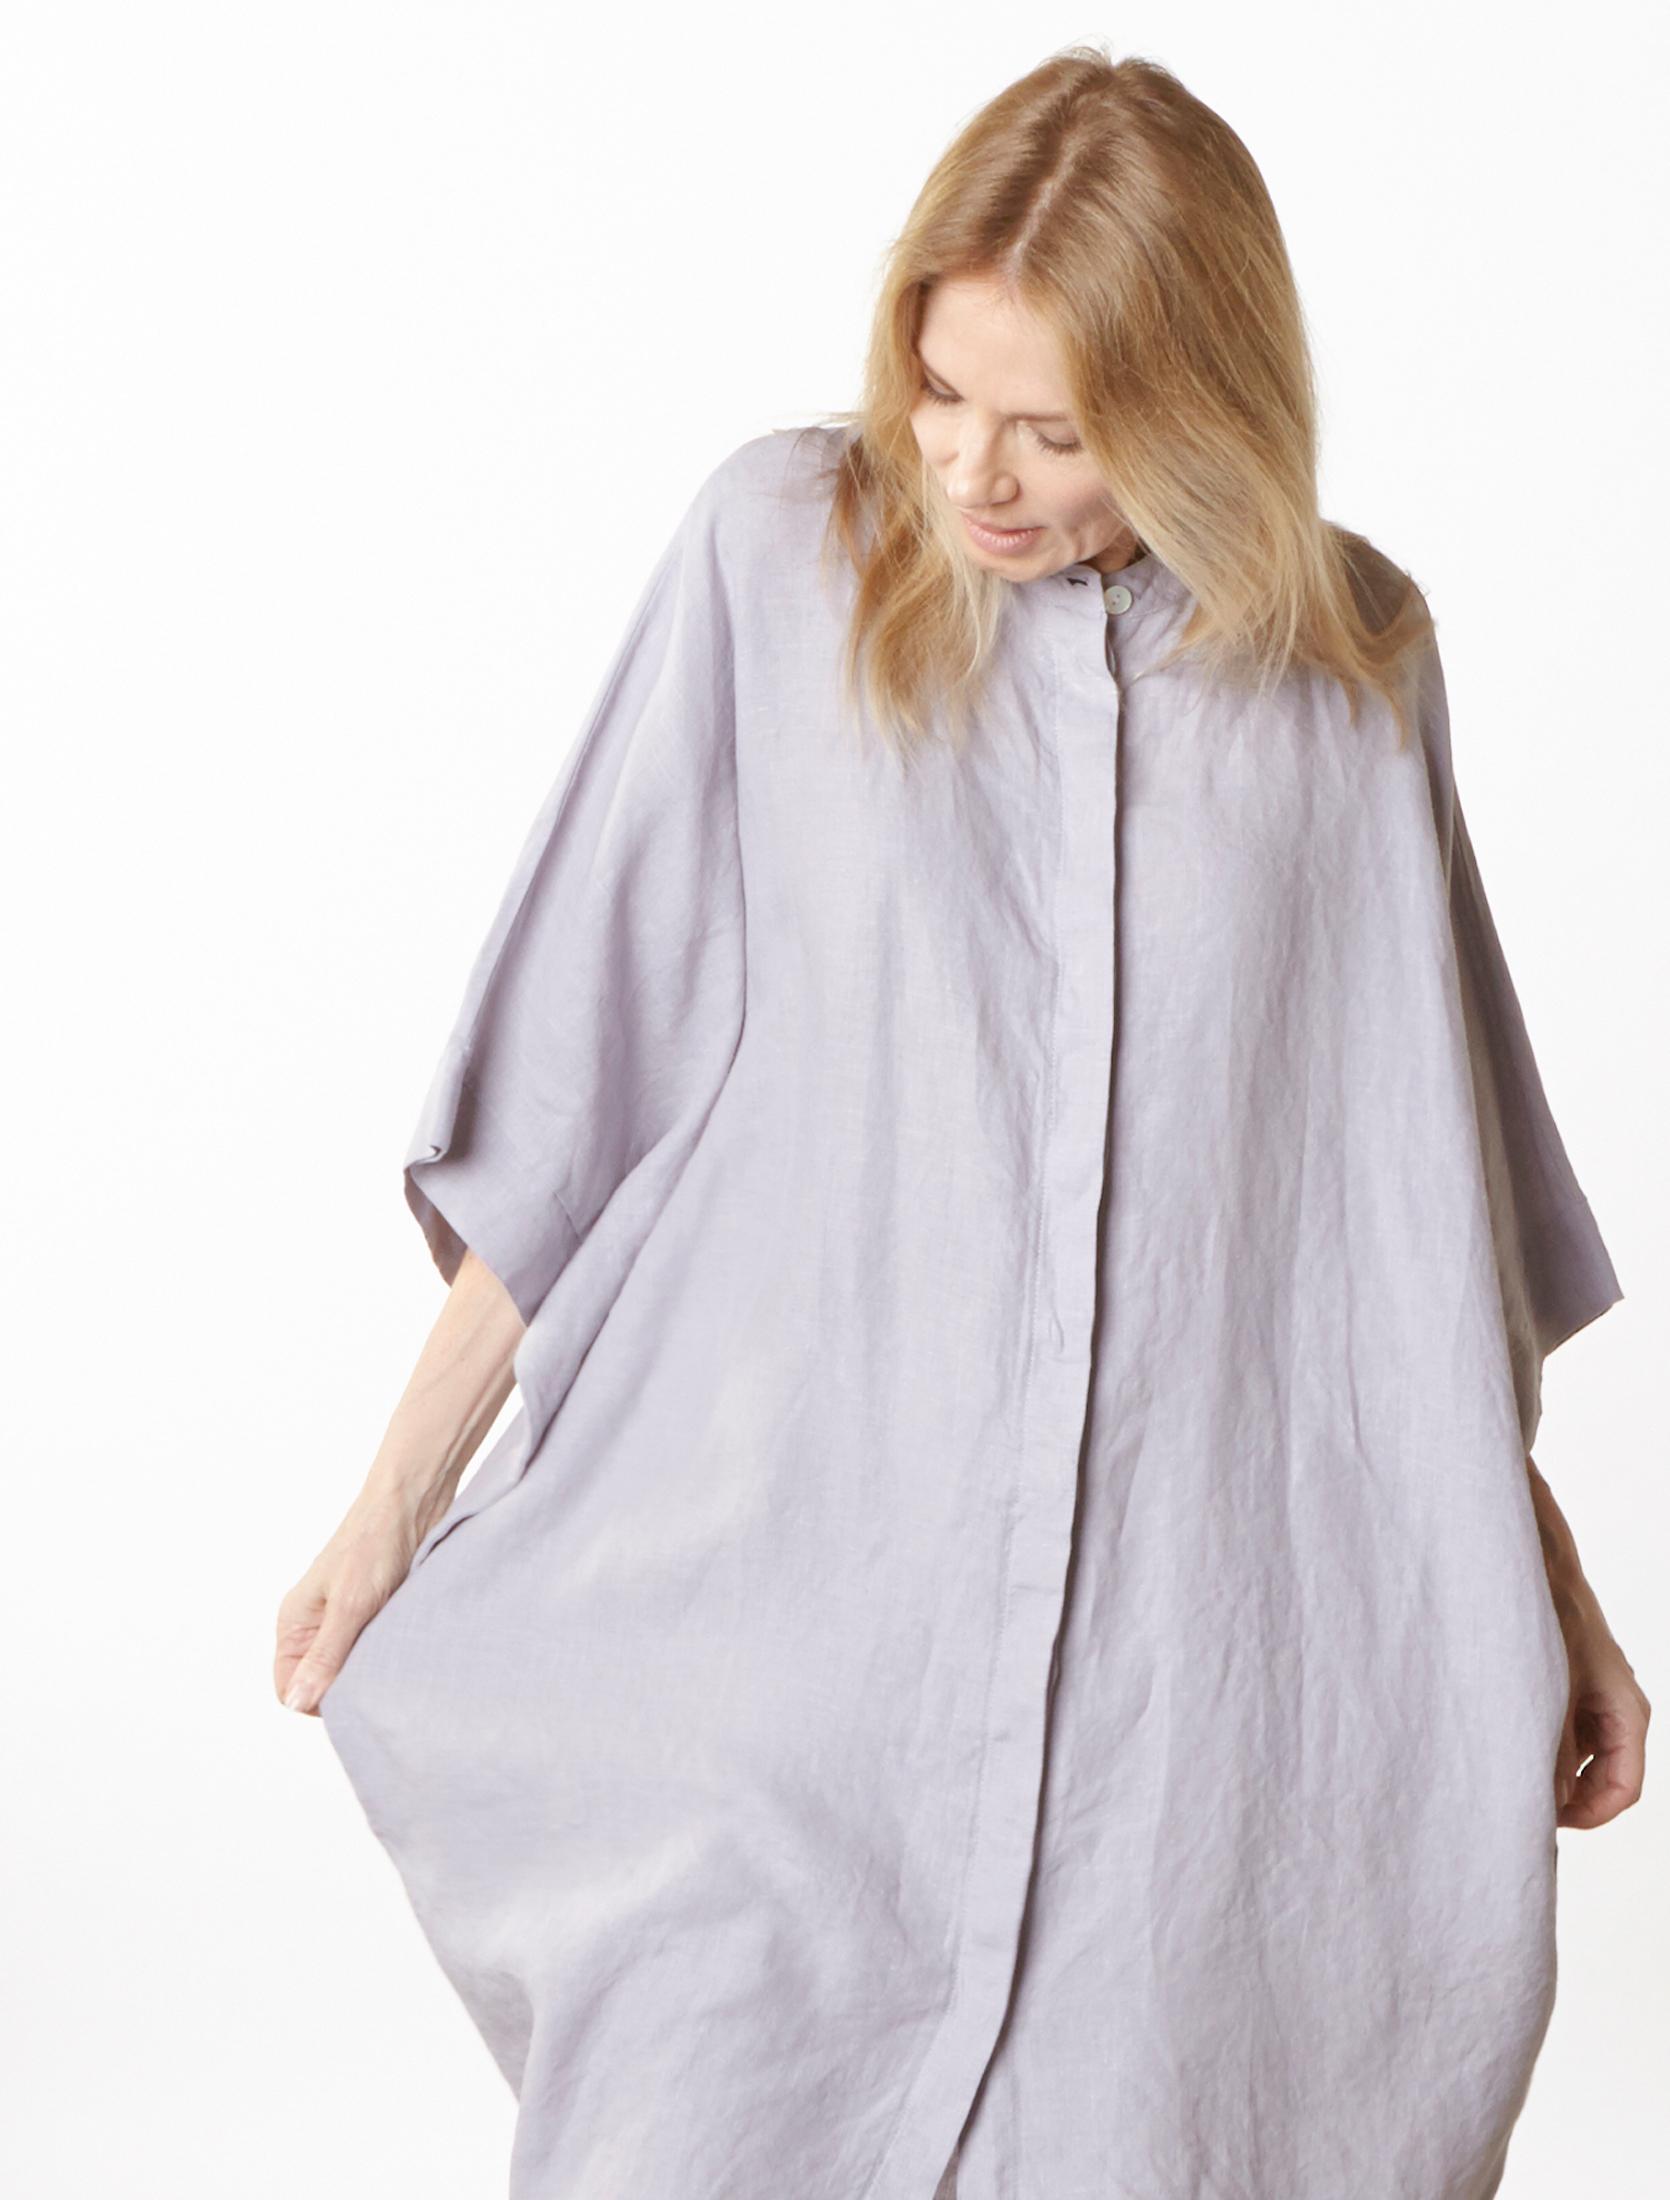 Jacoba Tunic in Dapple Light Linen